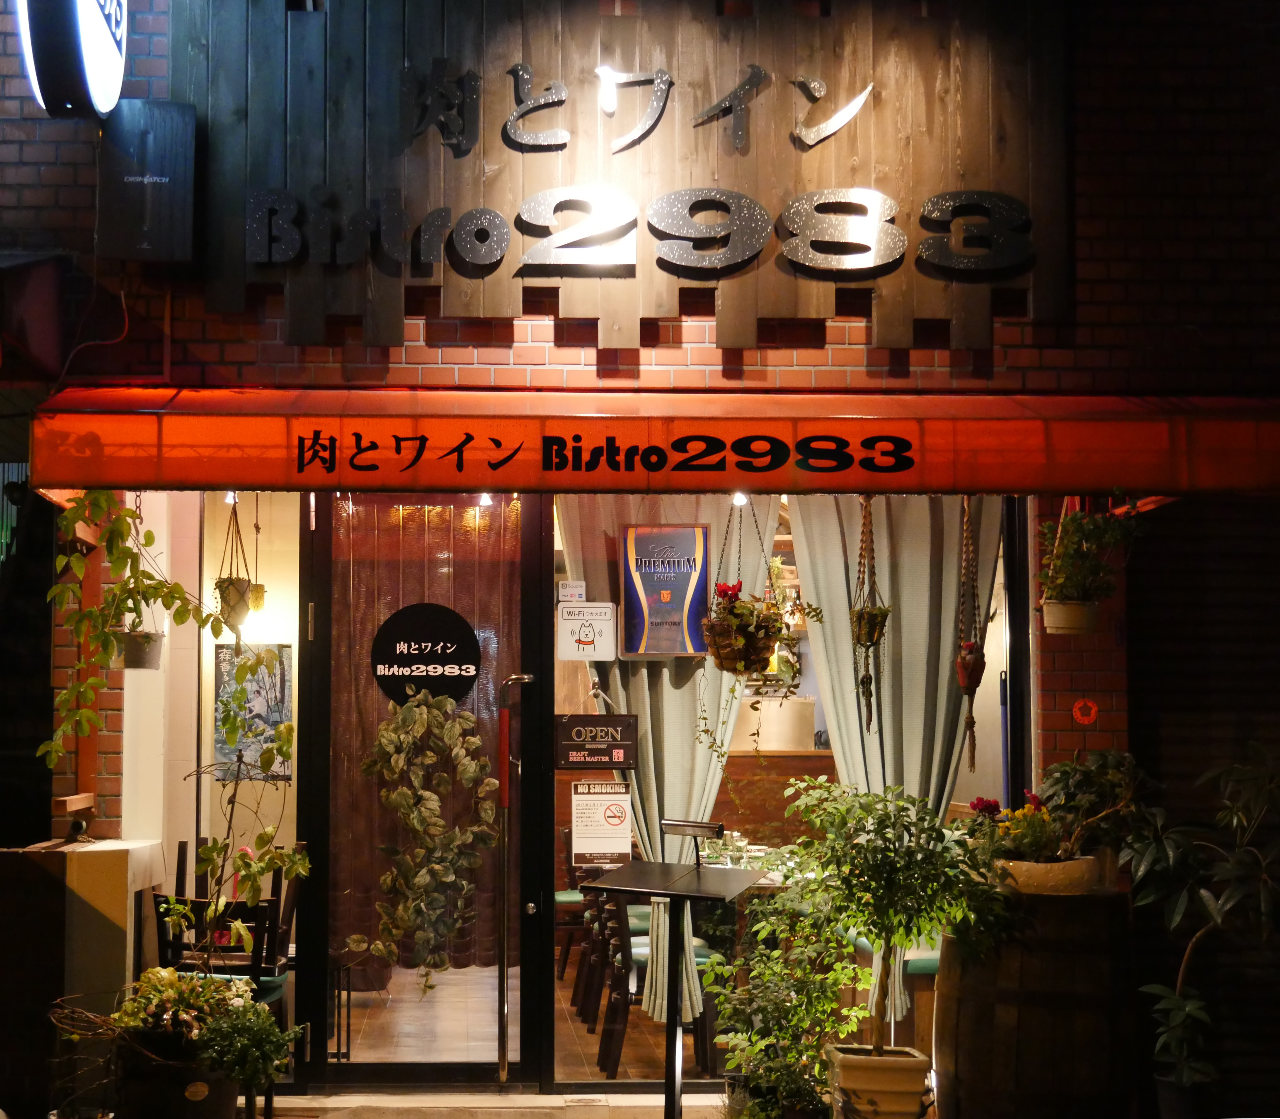 四谷/飯田橋/神楽坂_Bistro 2983_写真3